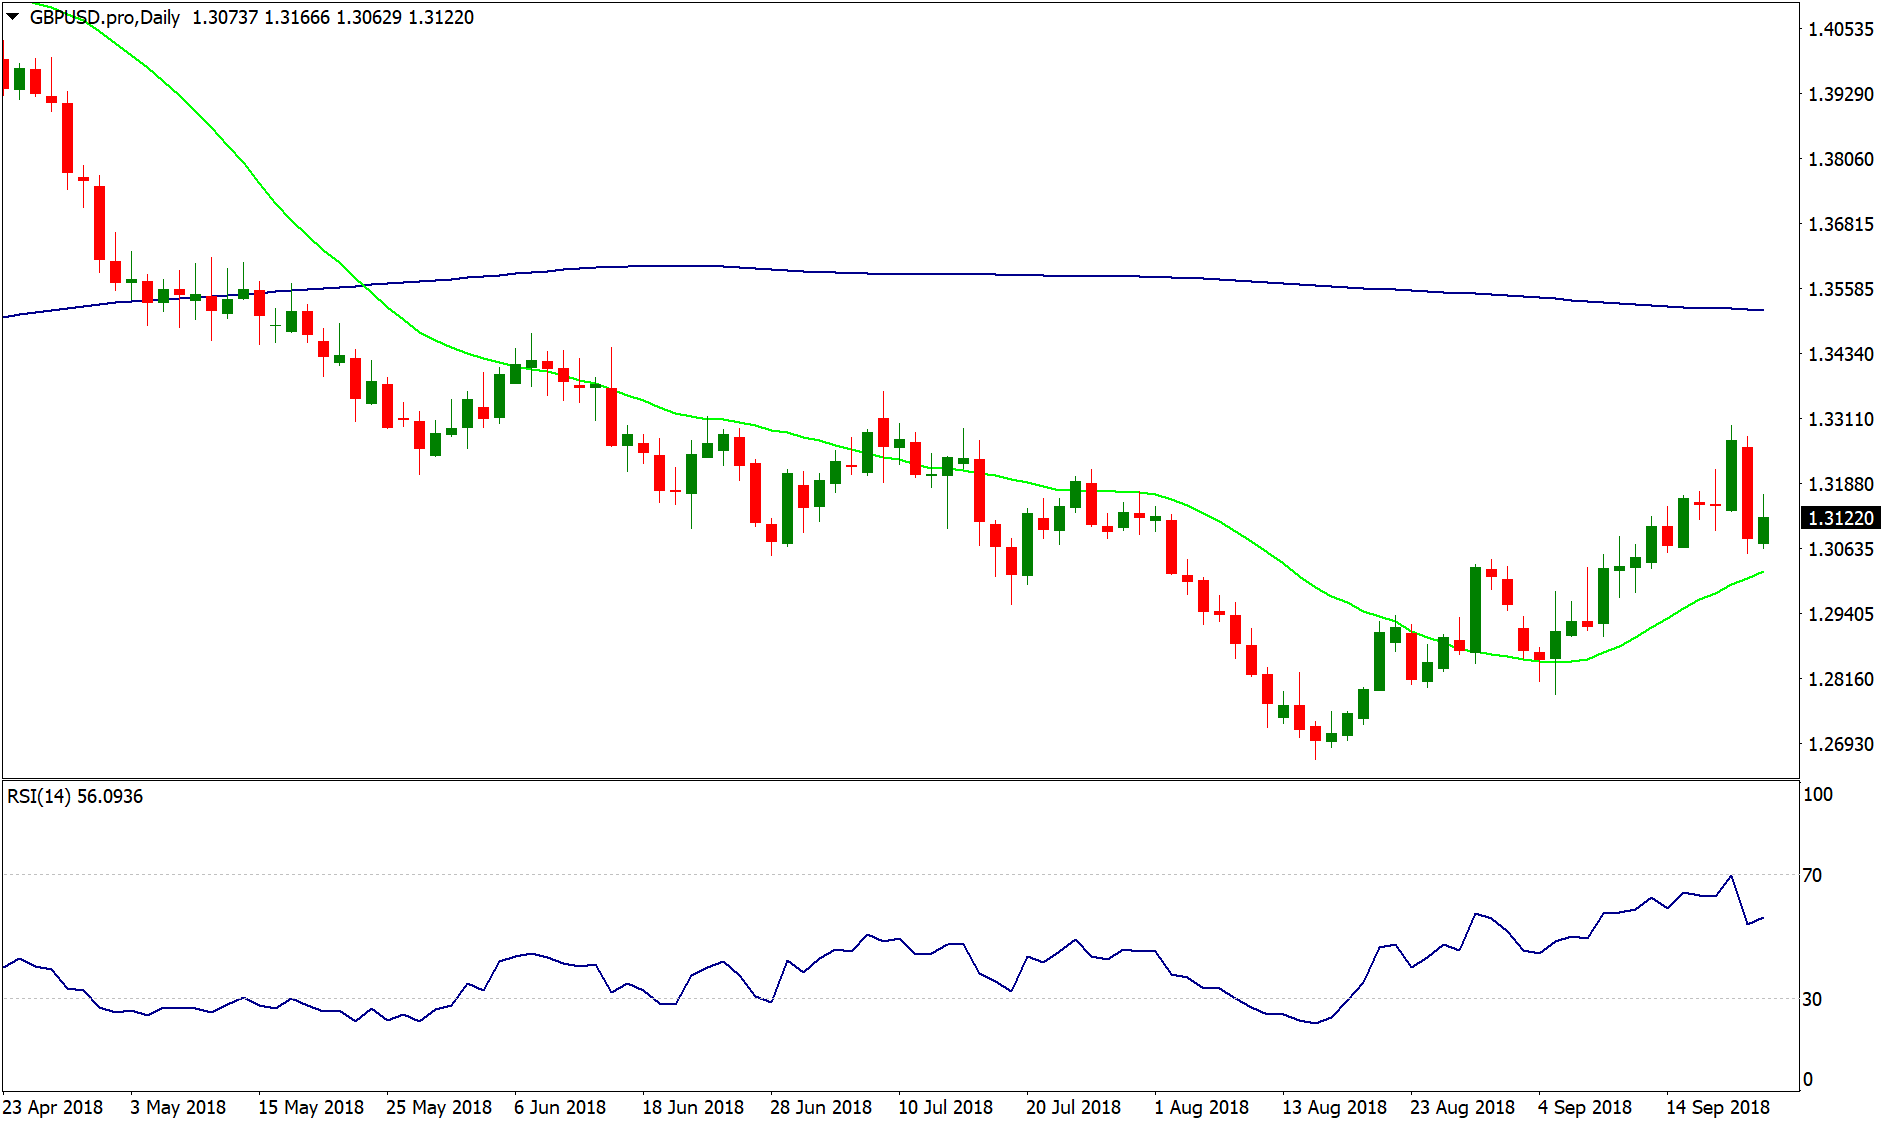 GBP/USD - D1